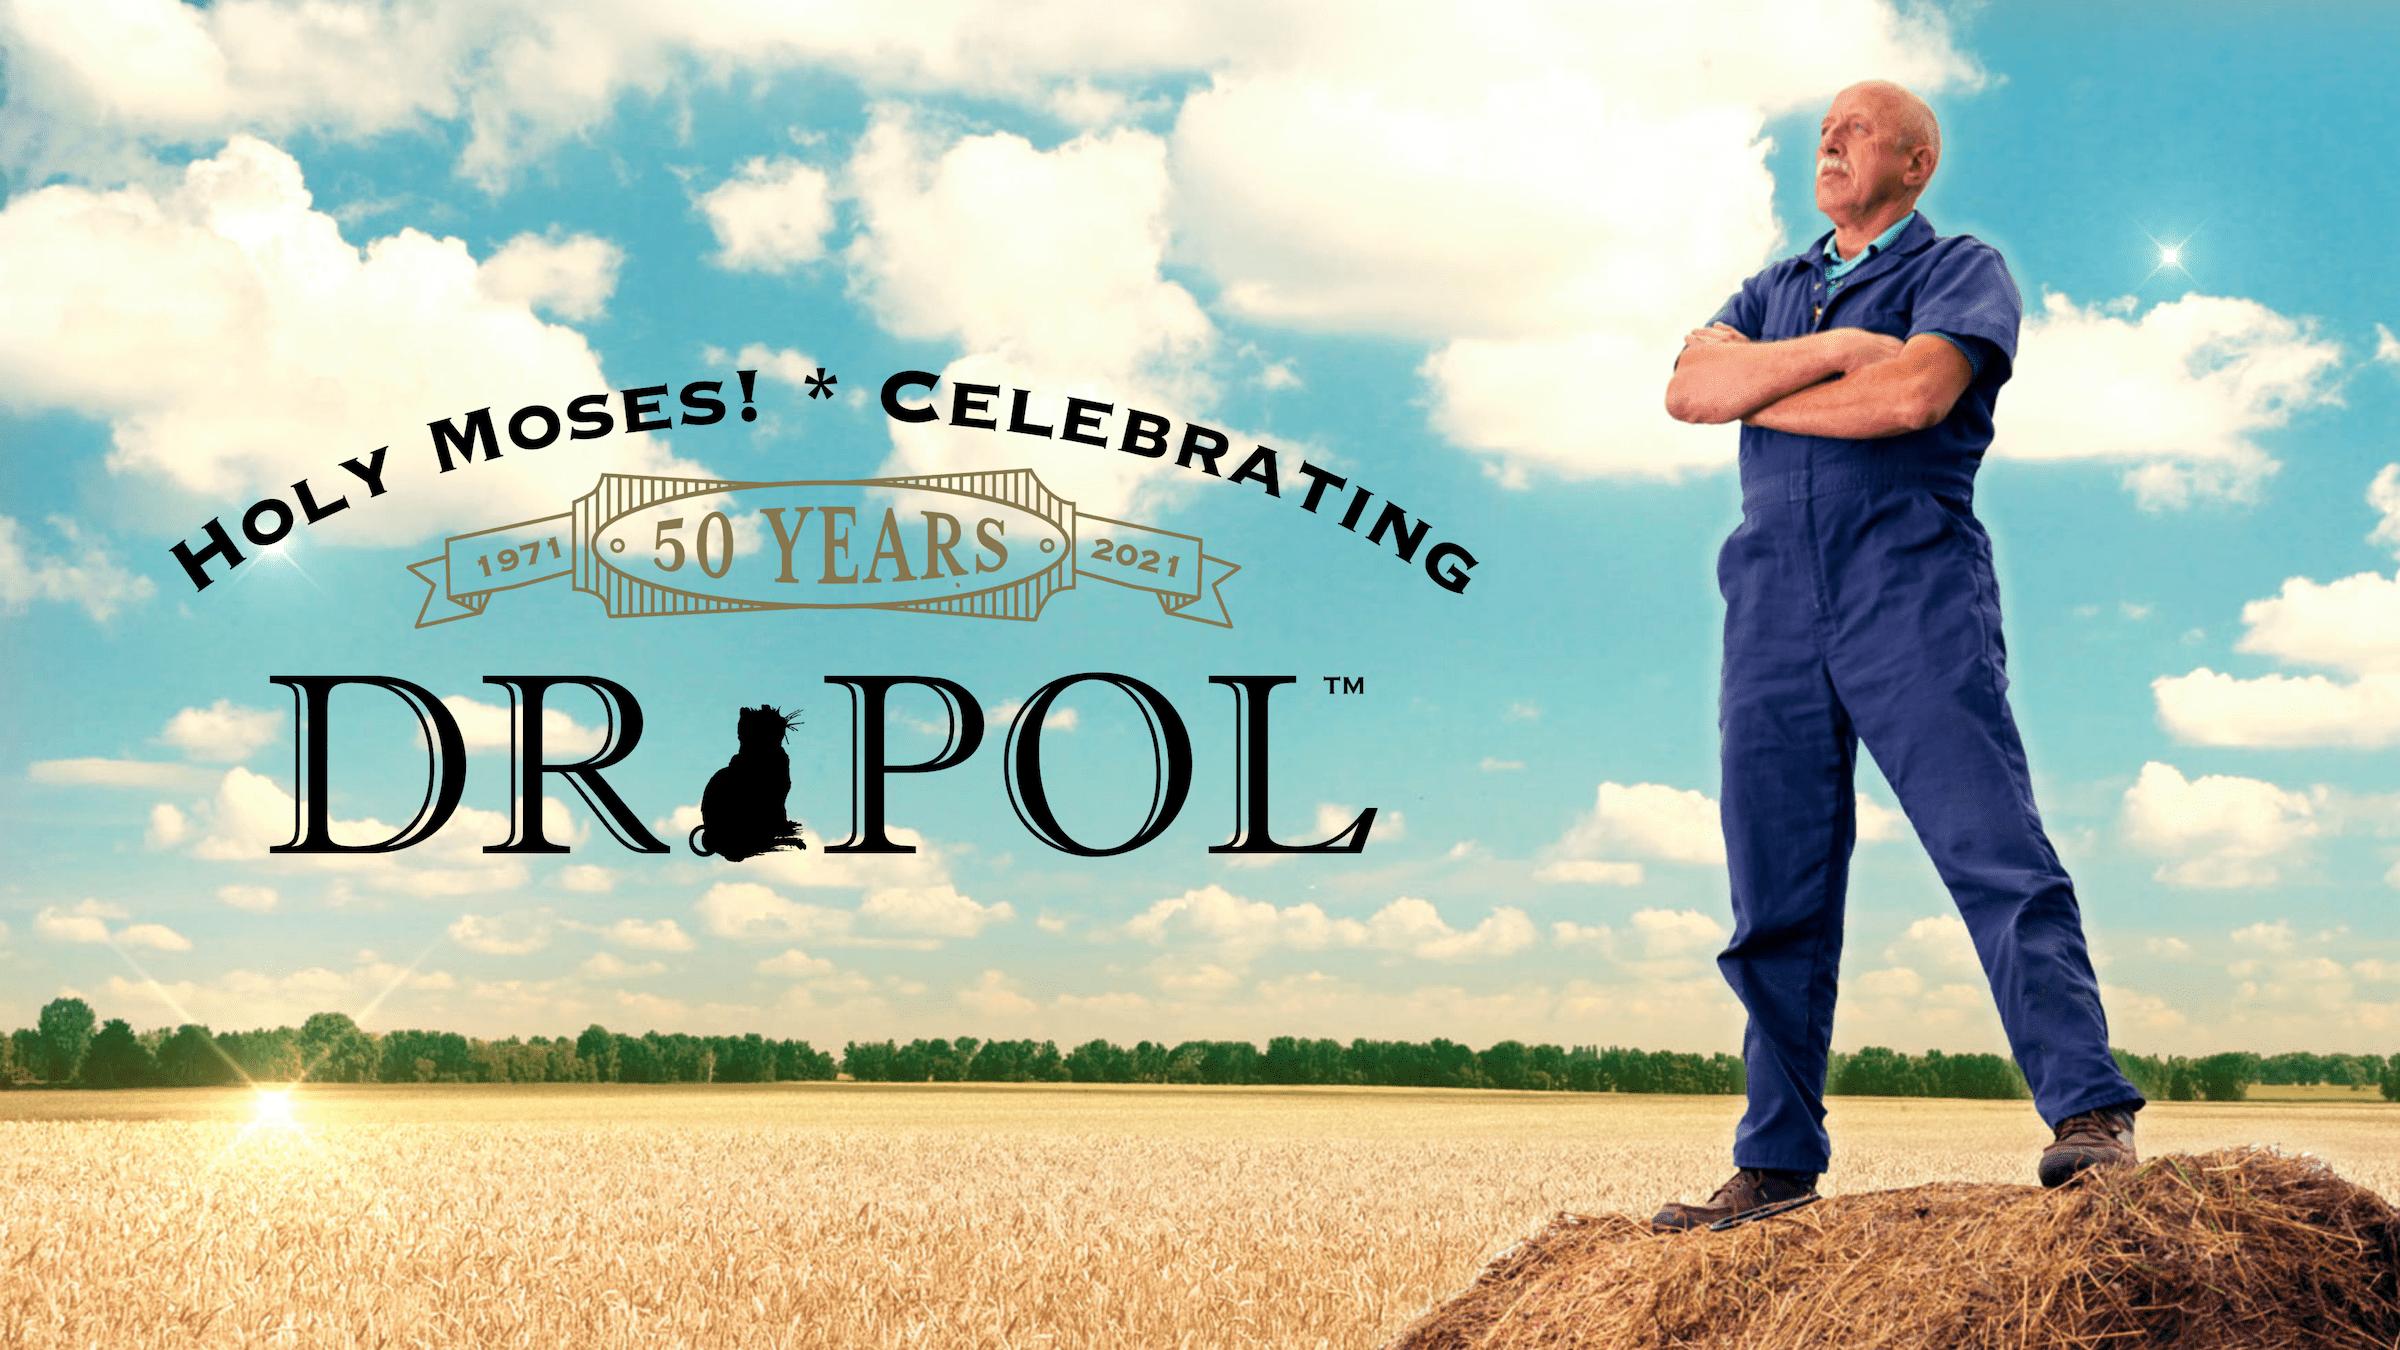 Dr Pol 50 Years